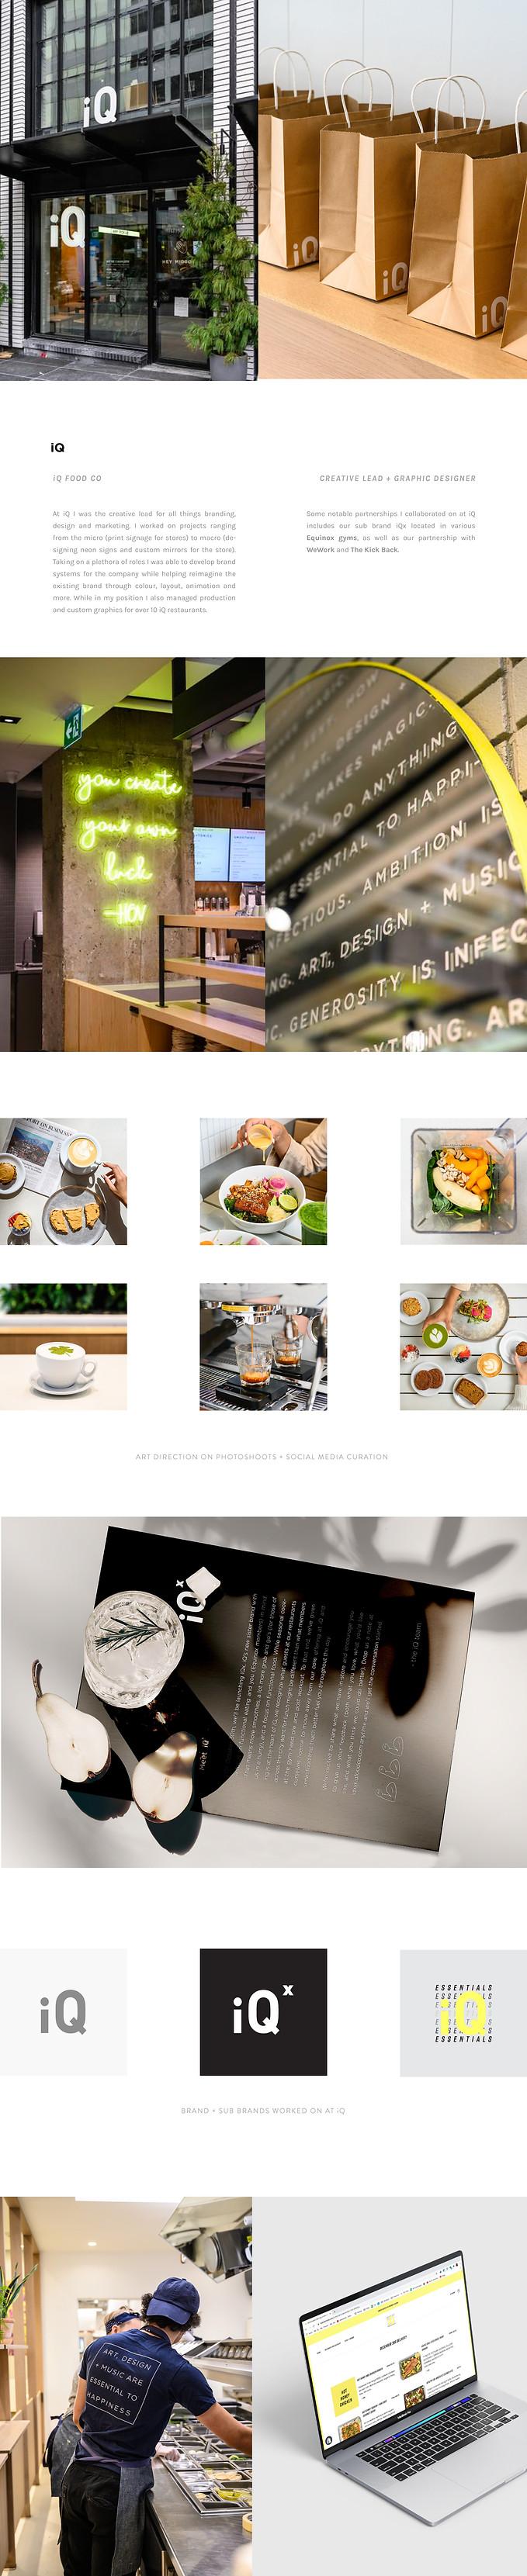 iQ-Portfolio-Spread.jpg